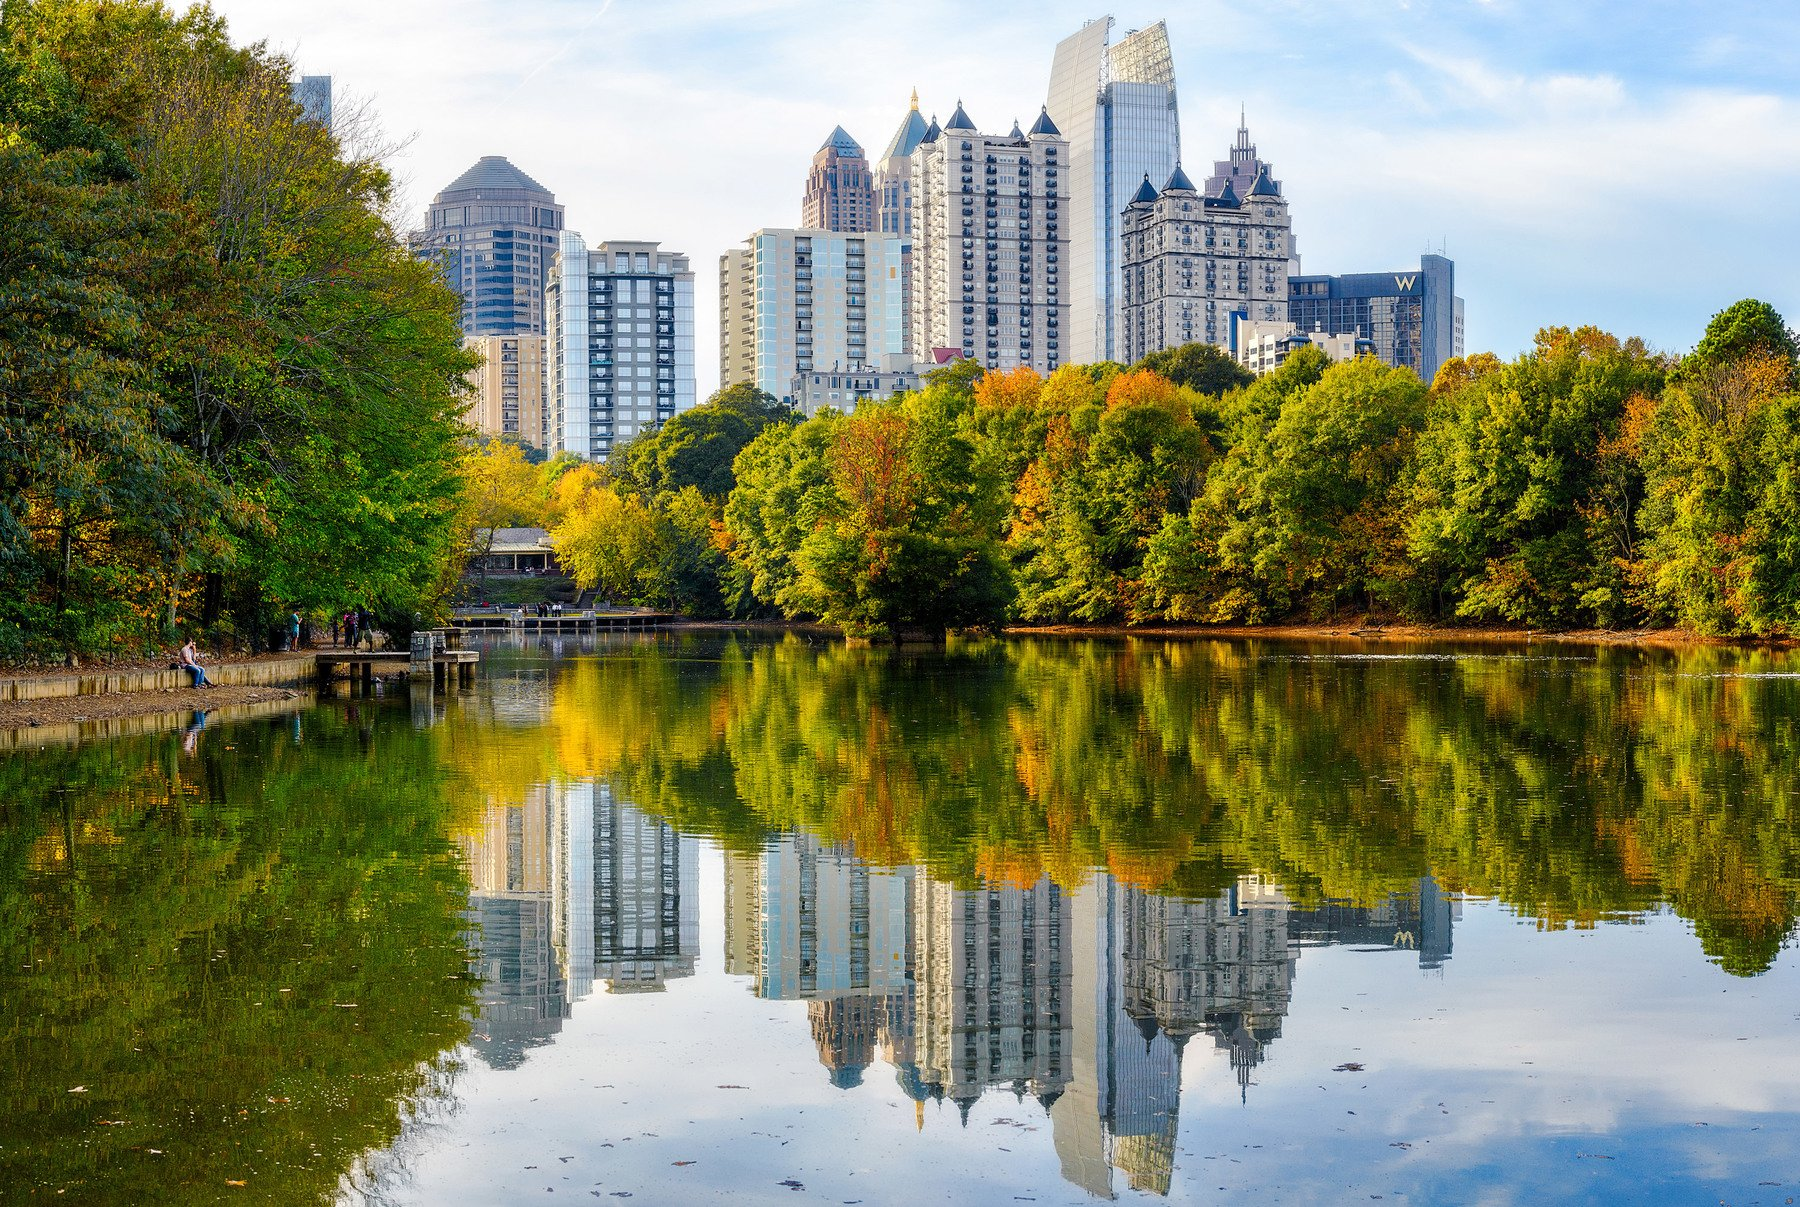 Midtown Atlanta buildings reflect off a lake at Piedmont Park.